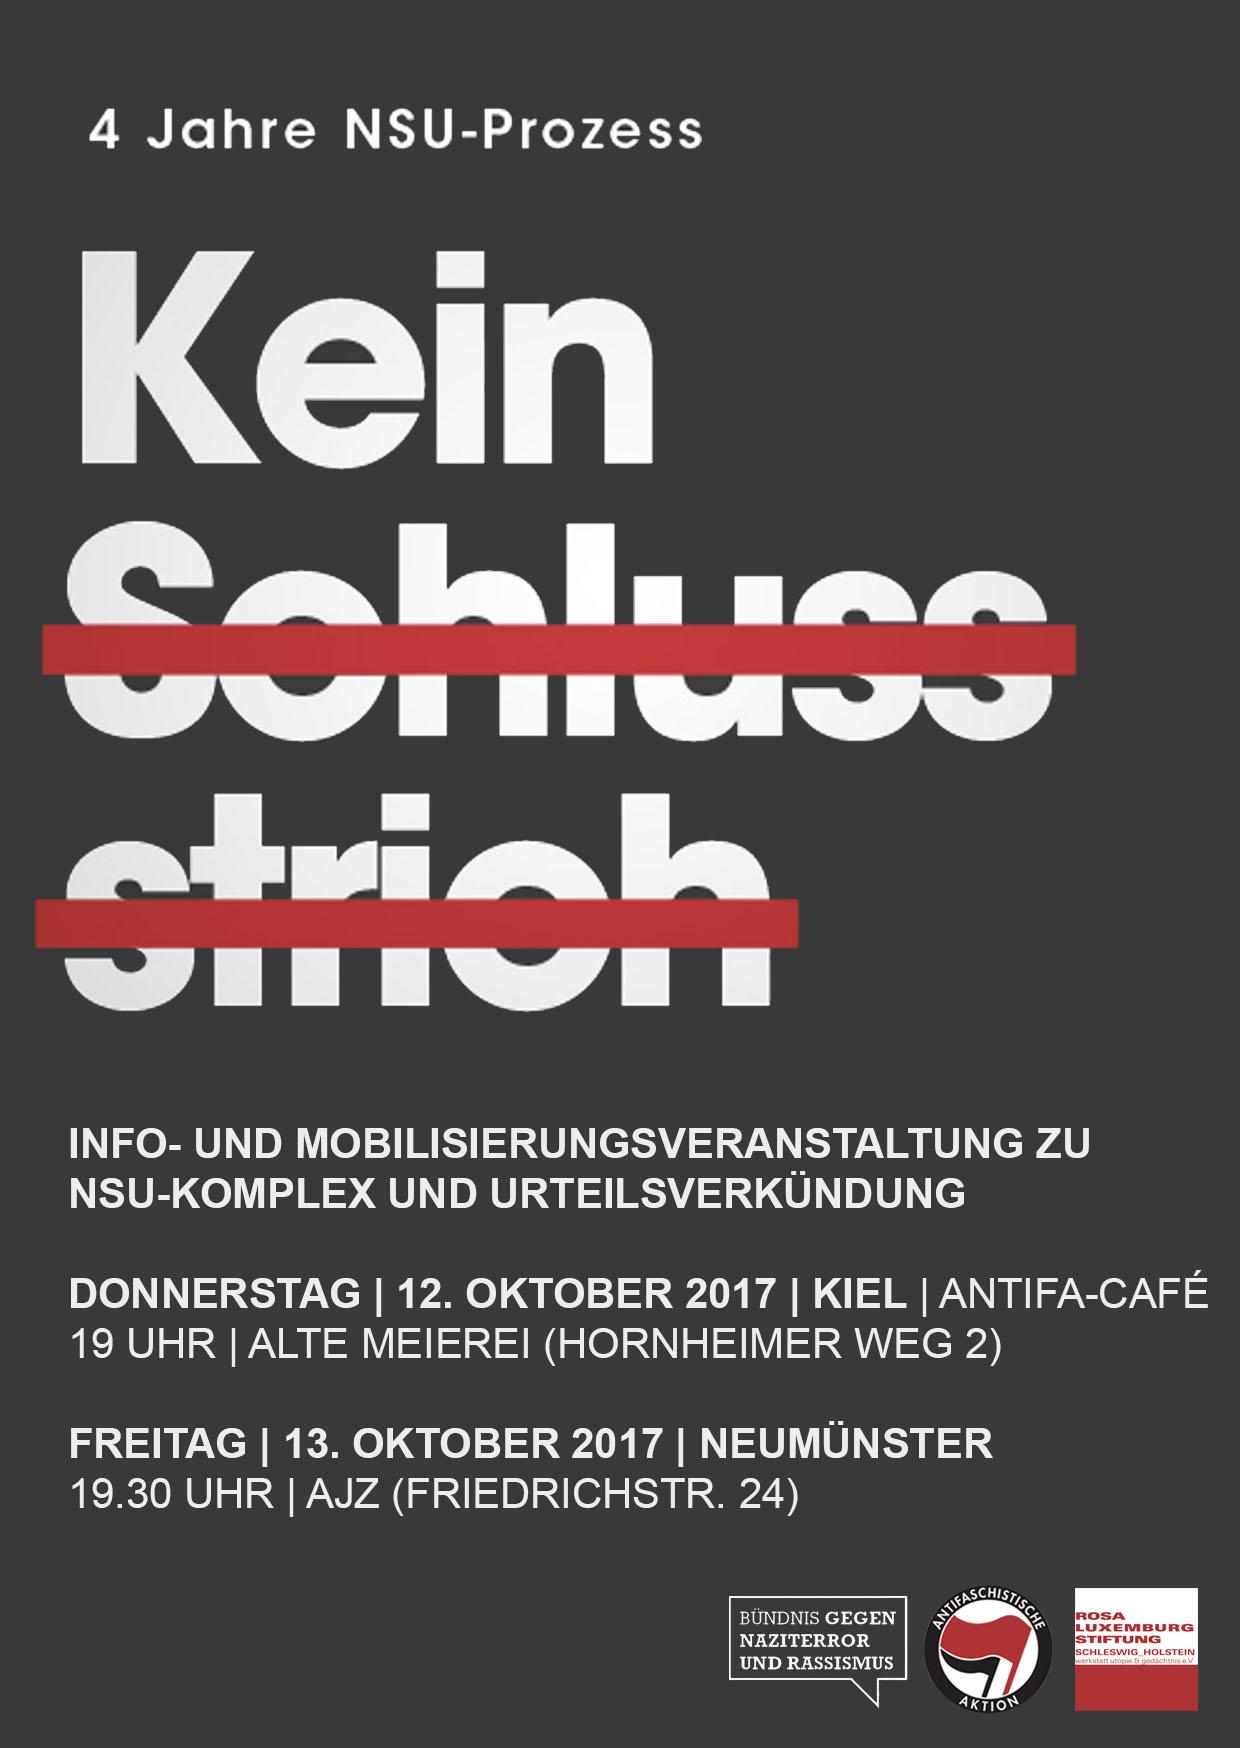 http://www.neu.antifa-kiel.org/wp-content/uploads/import/antifa-cafe/keinschlussstrich-web.jpg